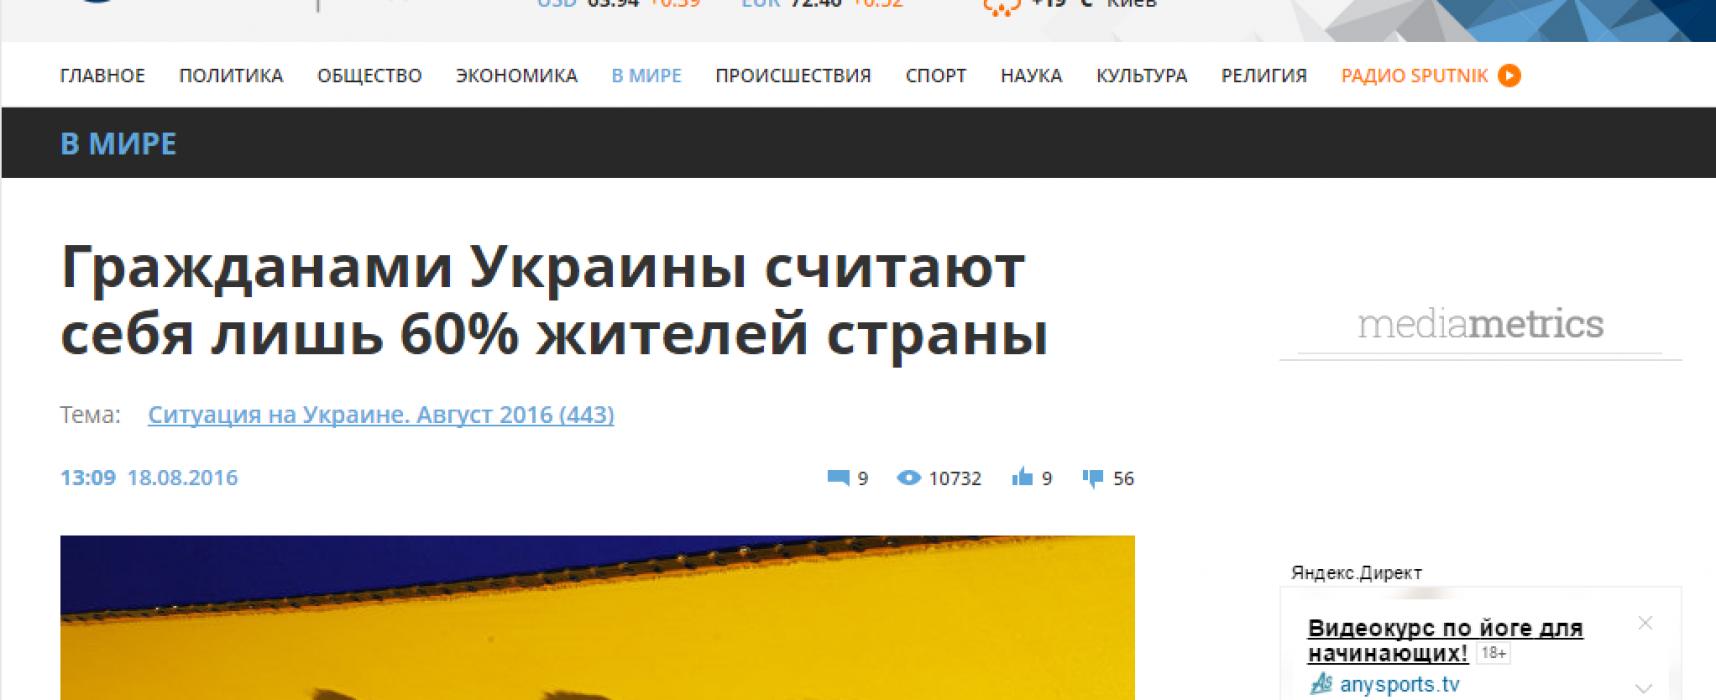 Russische media manipuleren peilingsresultaten over identiteit Oekraïners